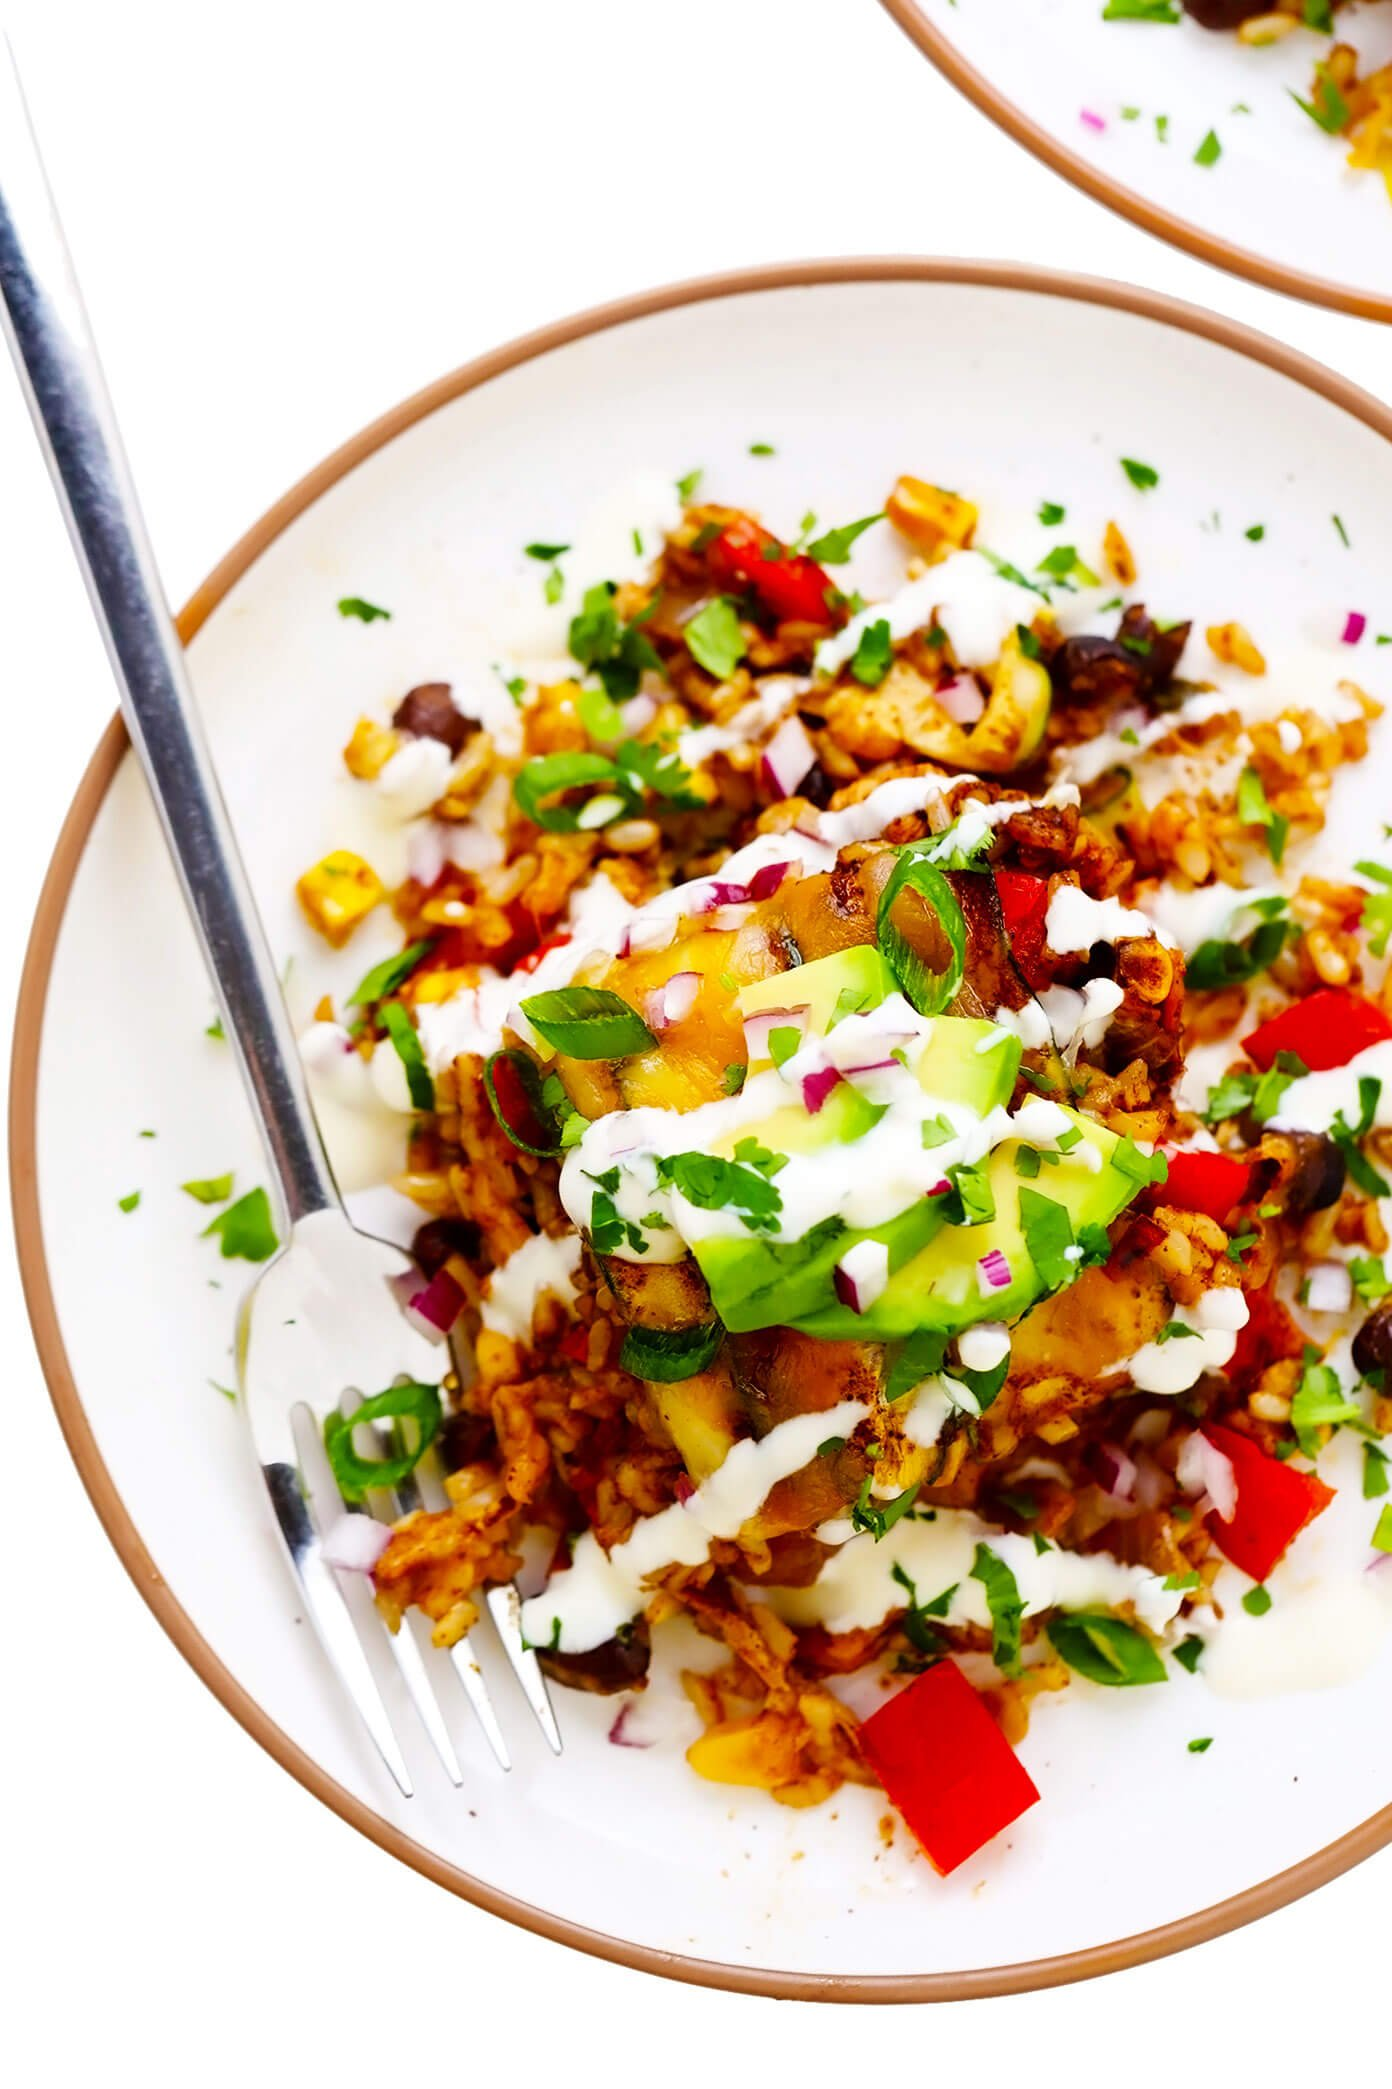 Zucchini Enchilada Casserole Slice on Plate